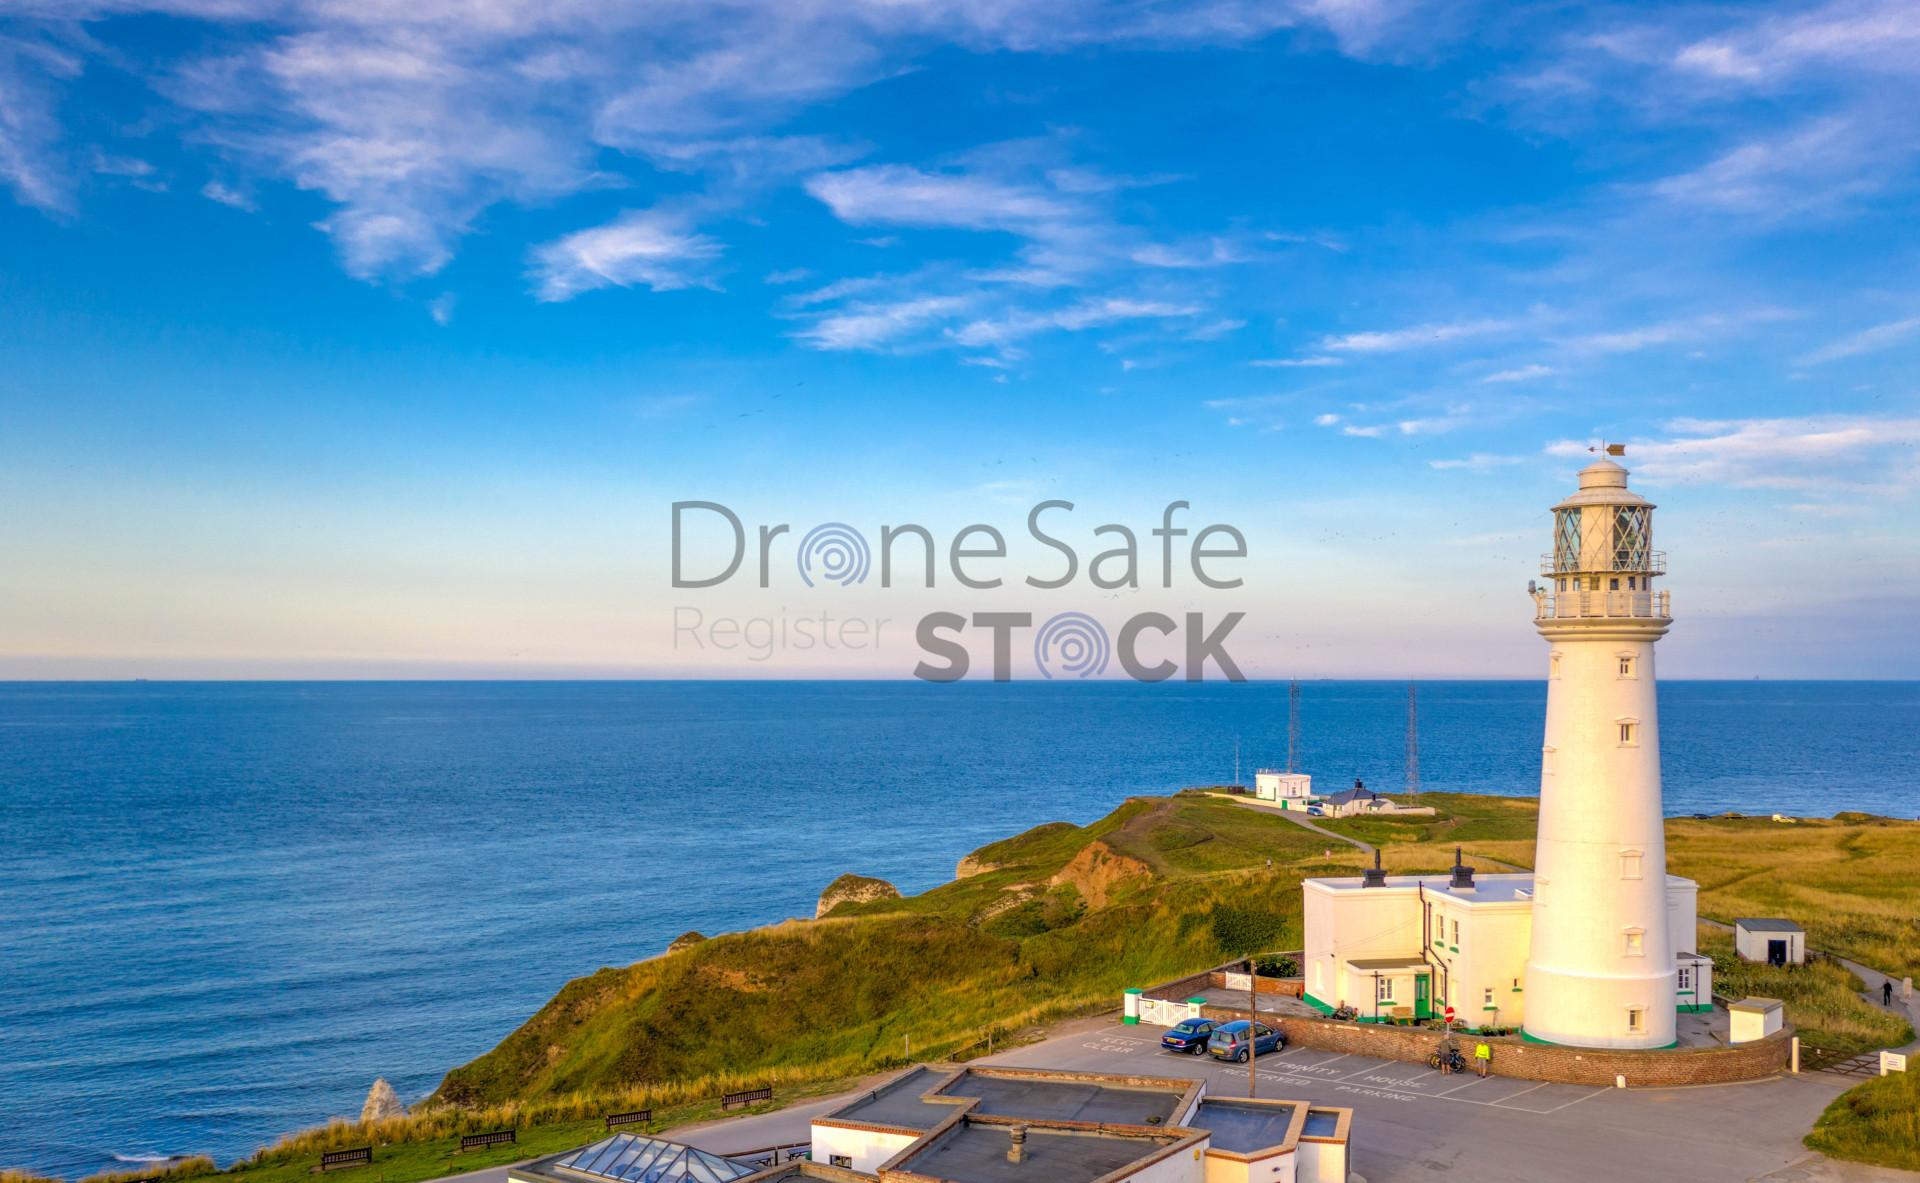 Drone ADIK